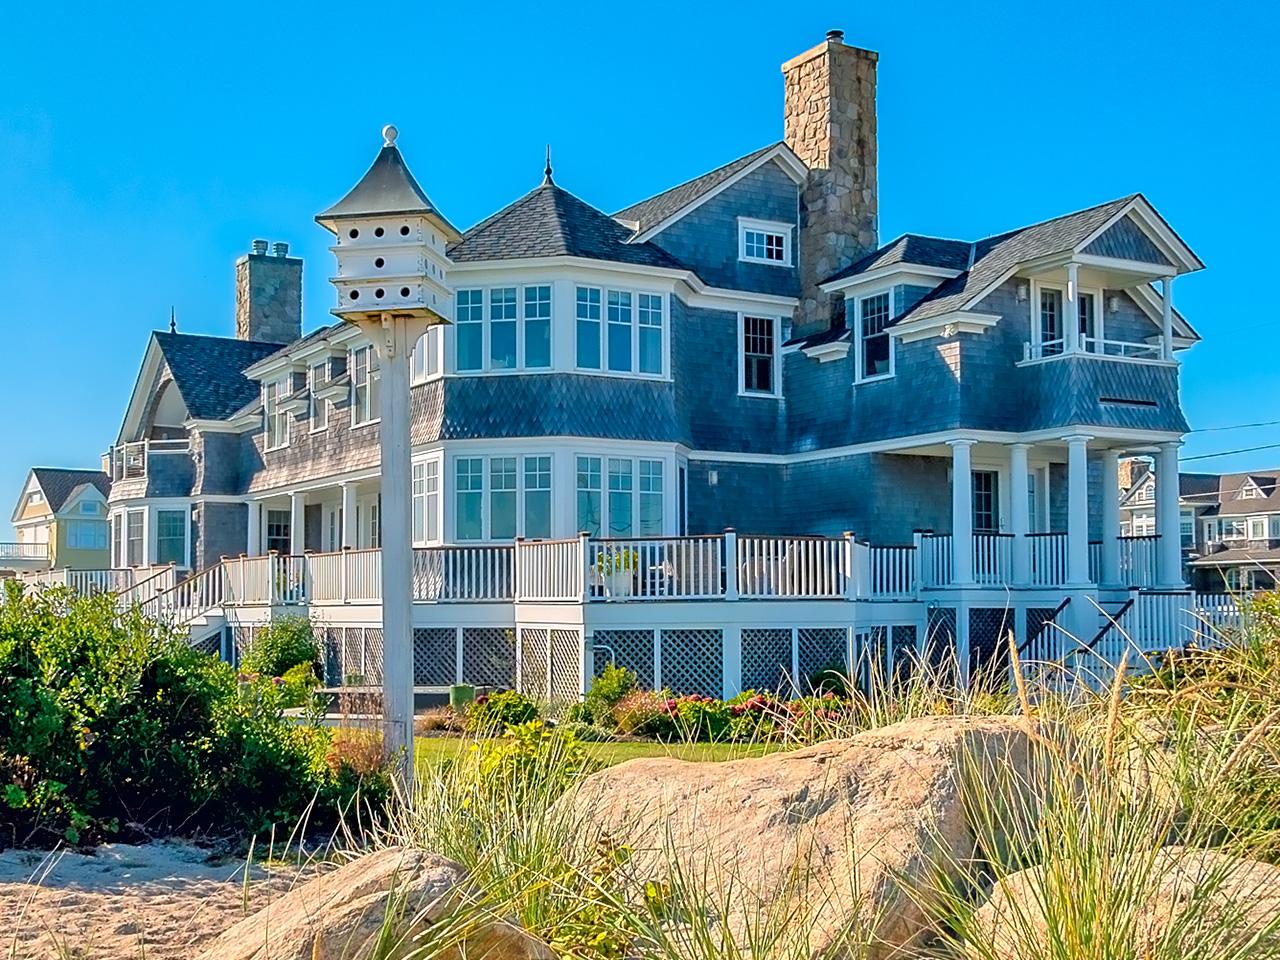 Stephen Sullivan Inc - Custom Home Builders Rhode Island Green Hill Beach House Feature Image